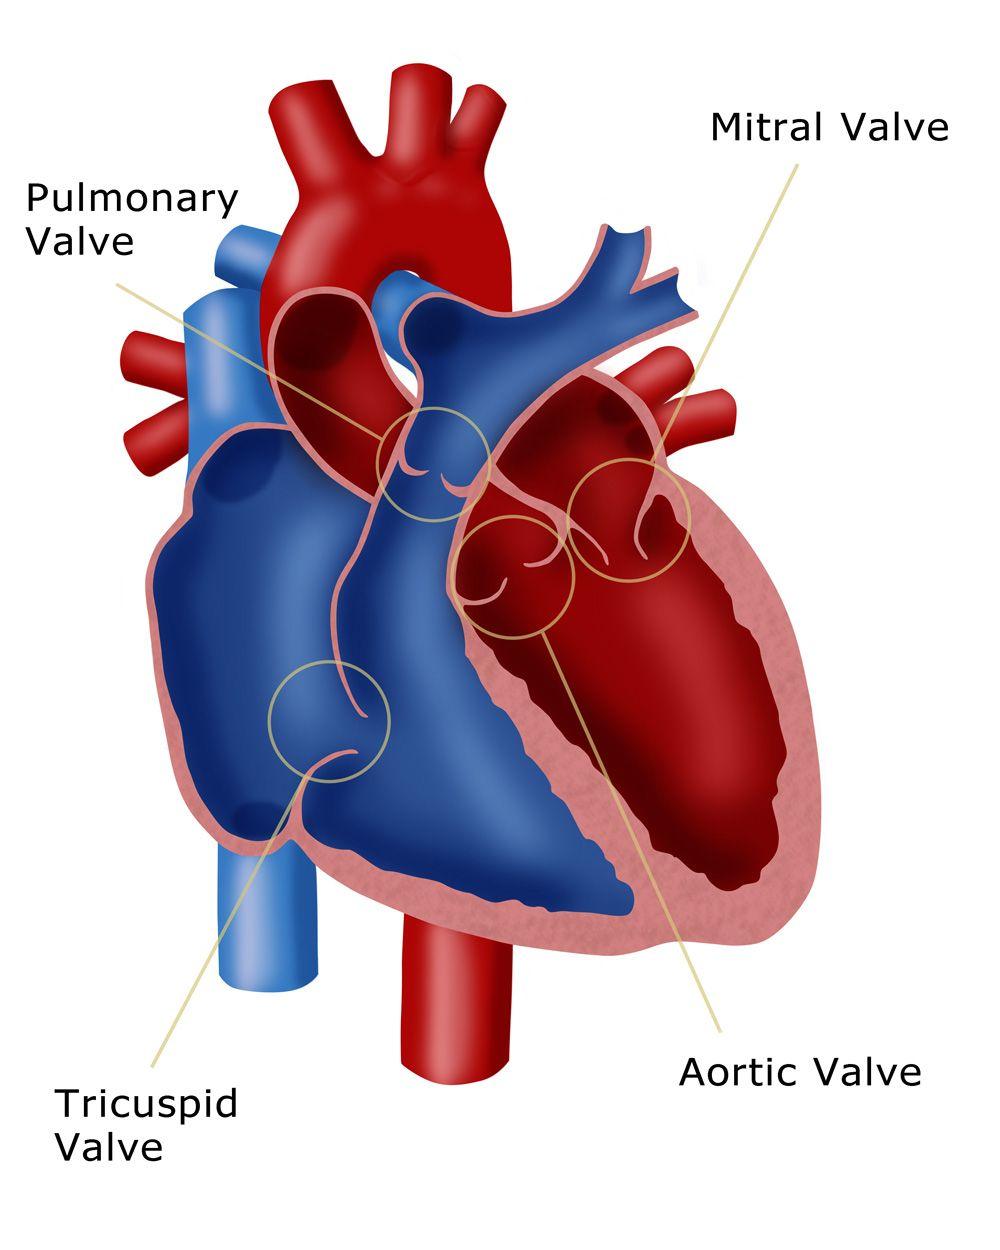 Pin by AngyScarlett on Heart | Pinterest | Heart anatomy, Anatomy ...